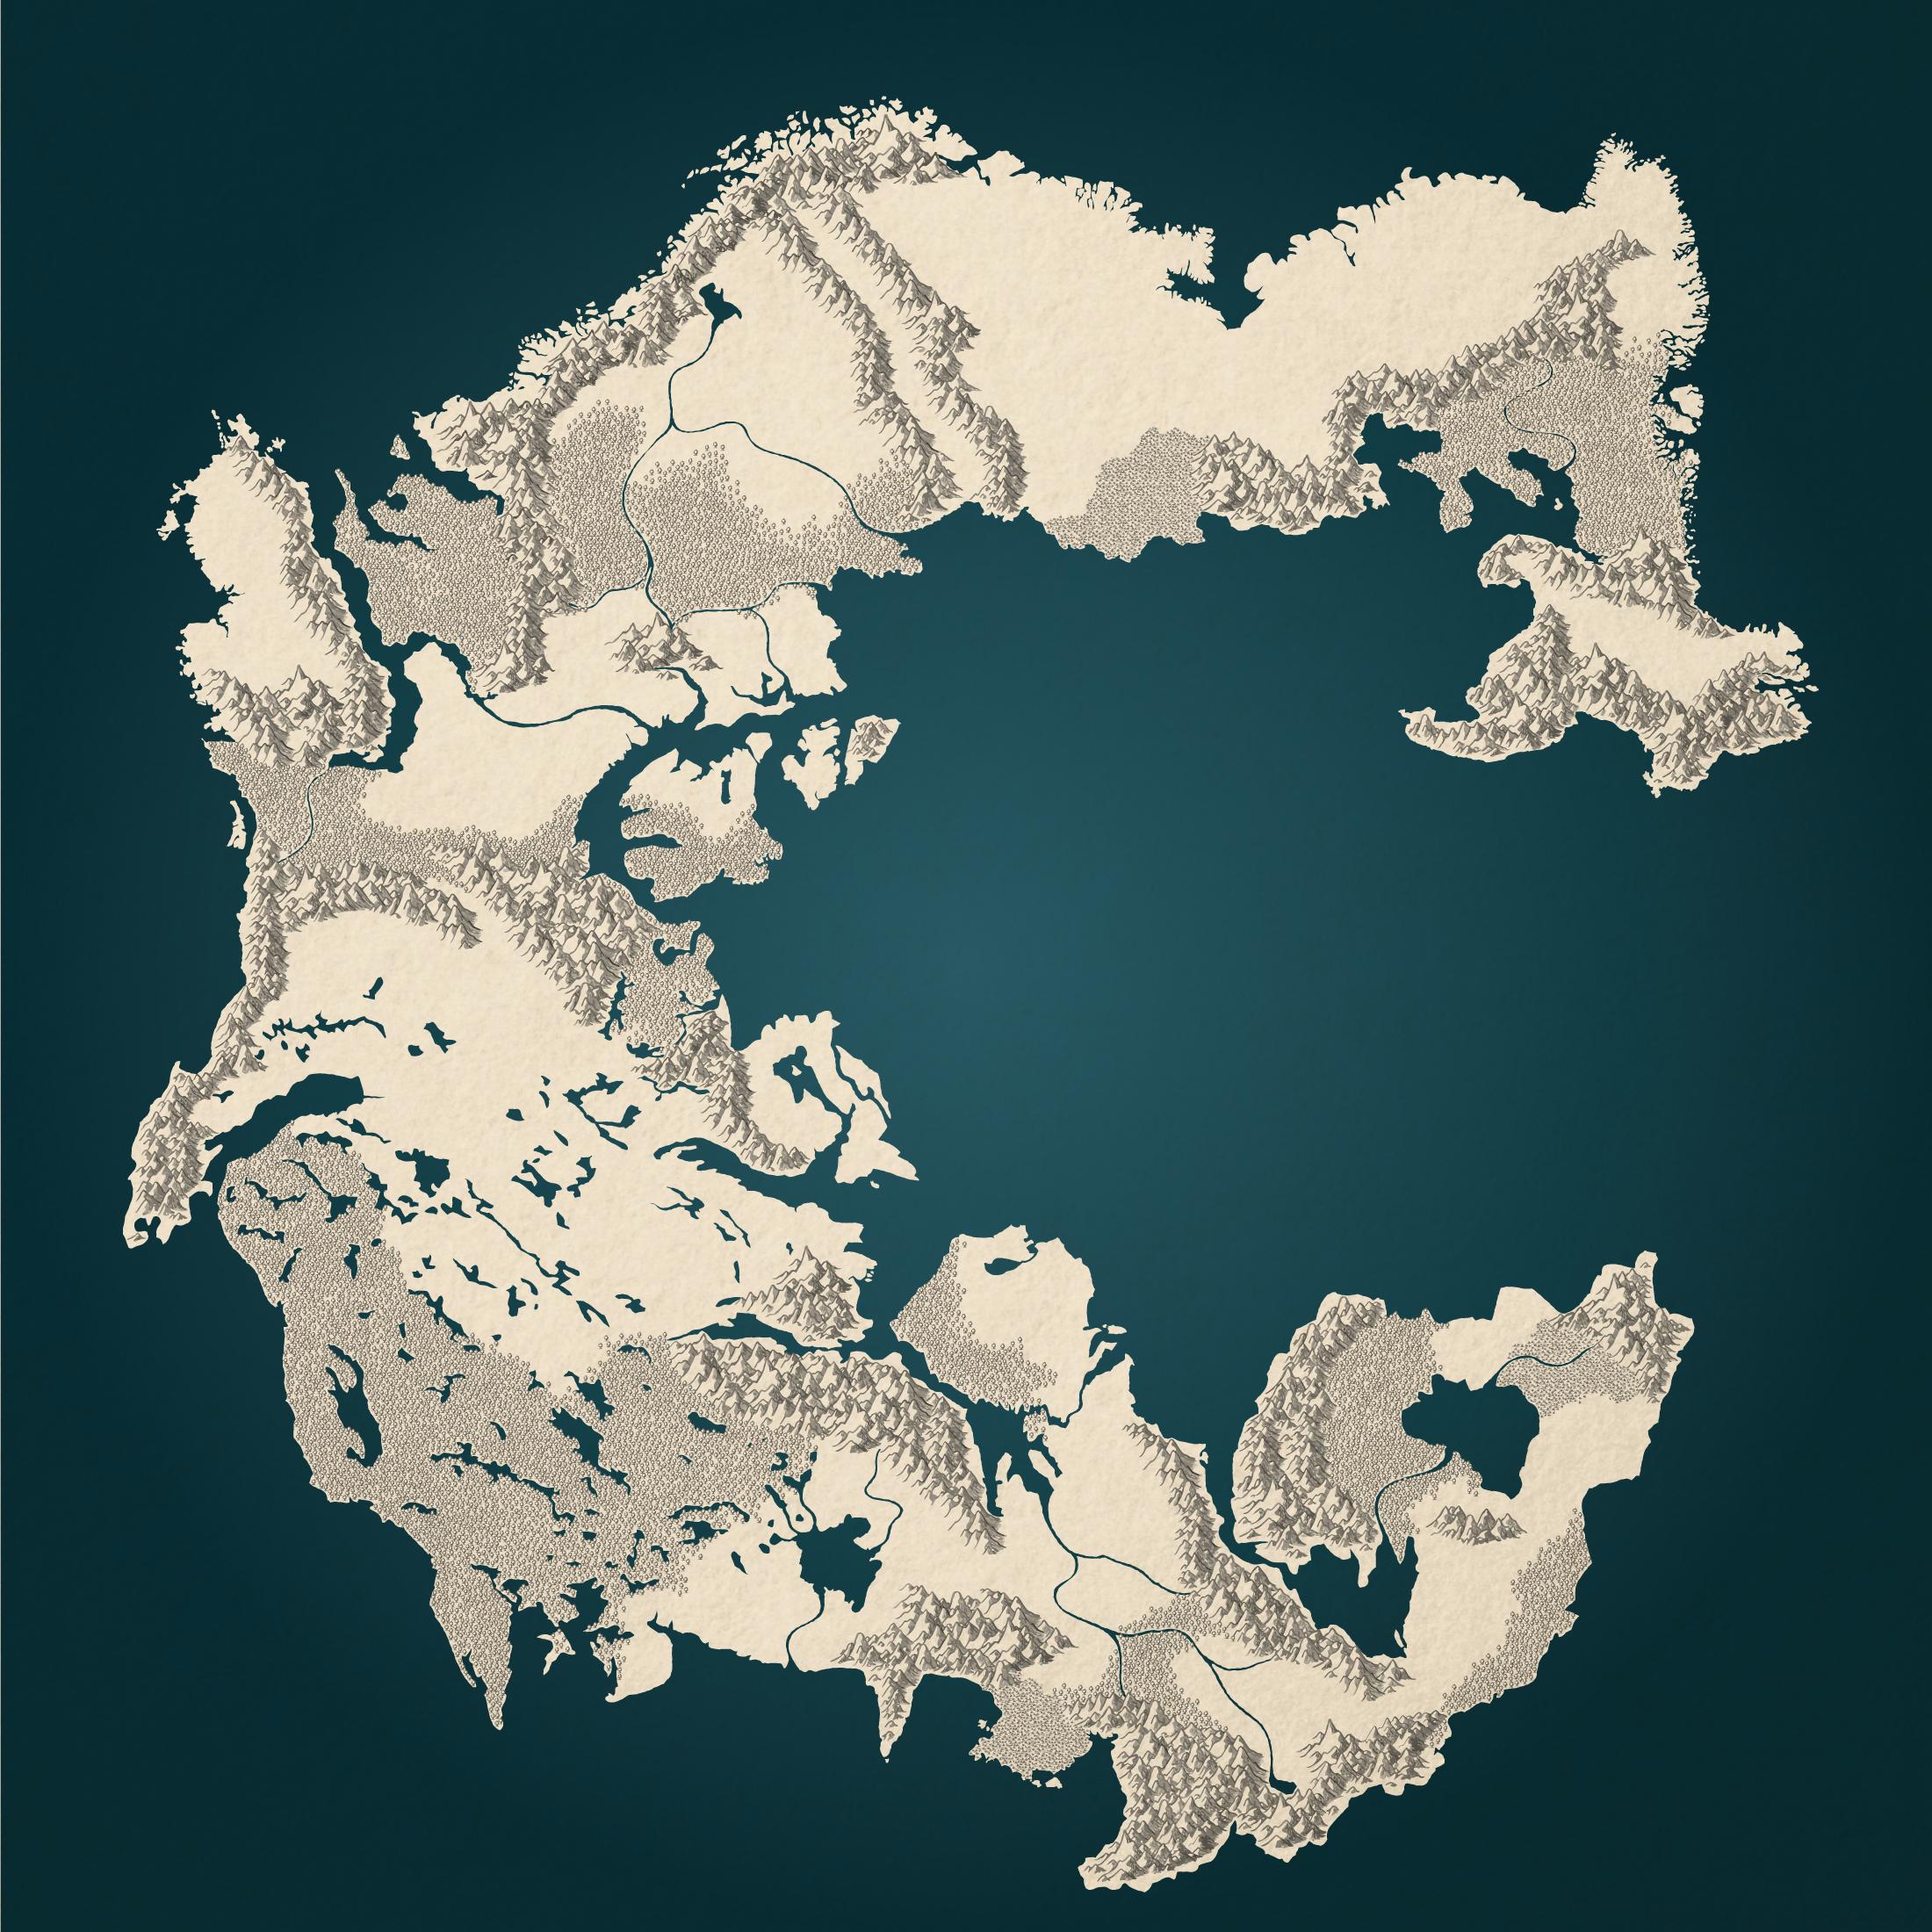 YavmirMapTerrainComplete